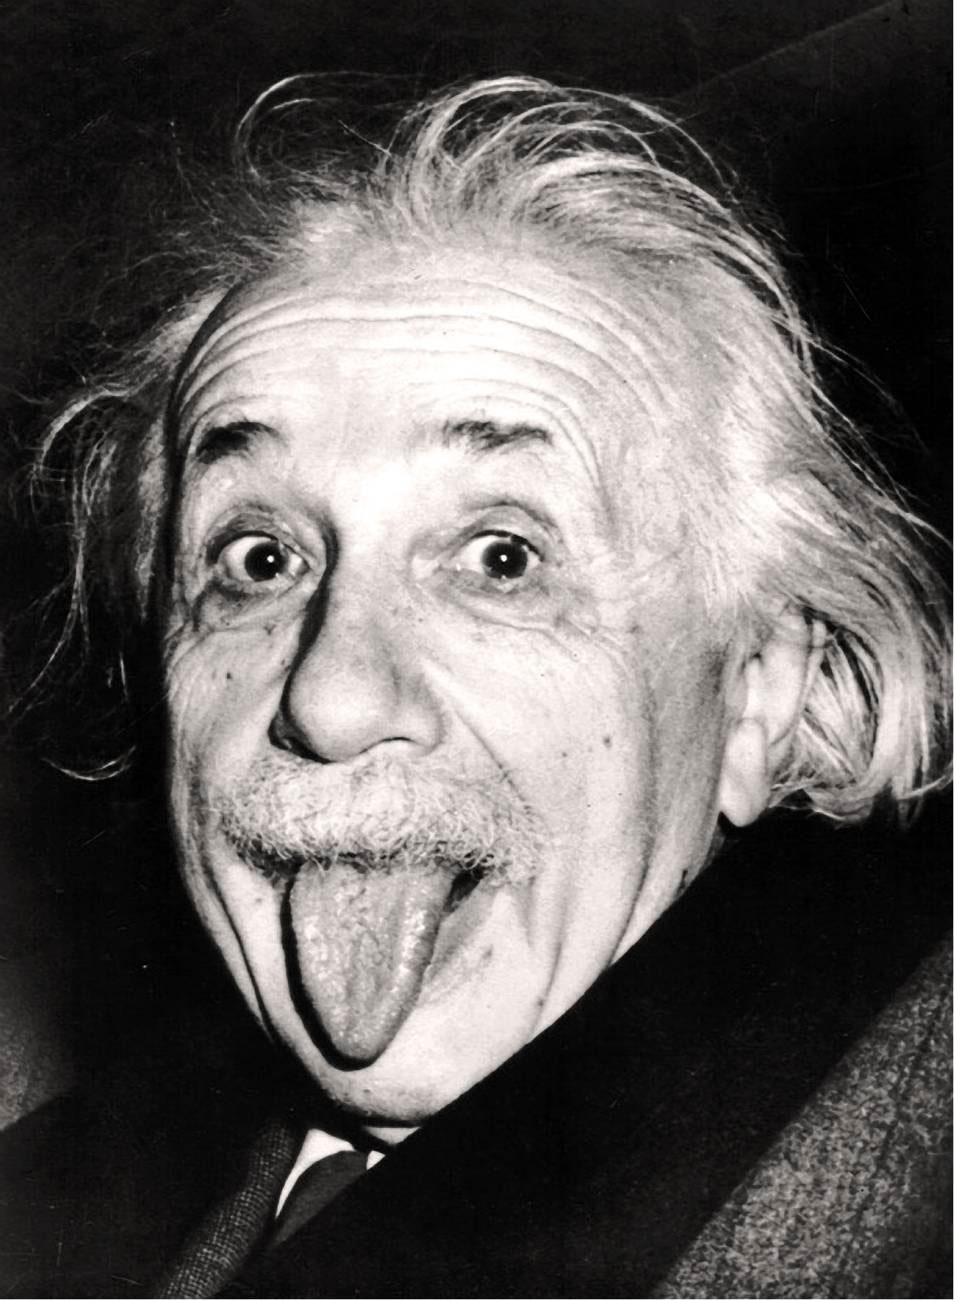 Альберт Енштейн